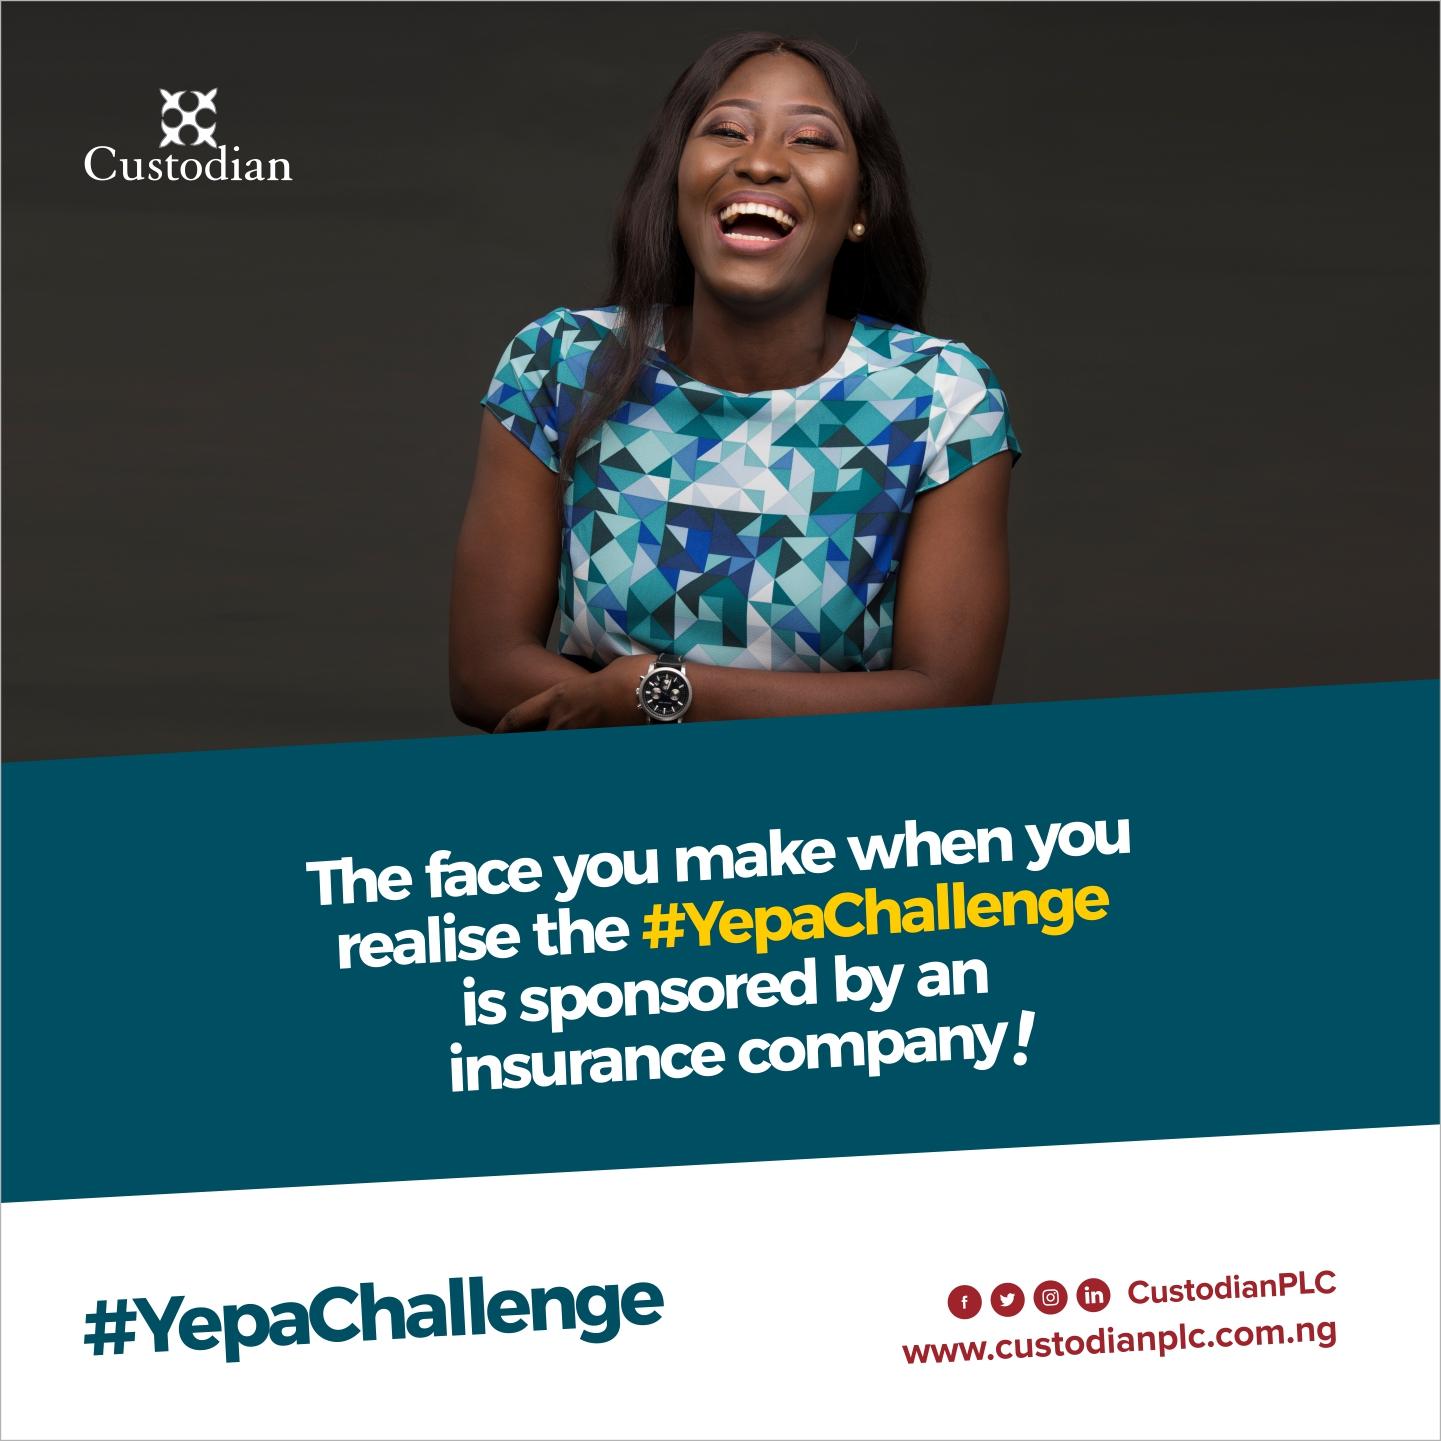 Custodian Sponsors #YepaChallenge To Call Attention To Insurance In Nigeria